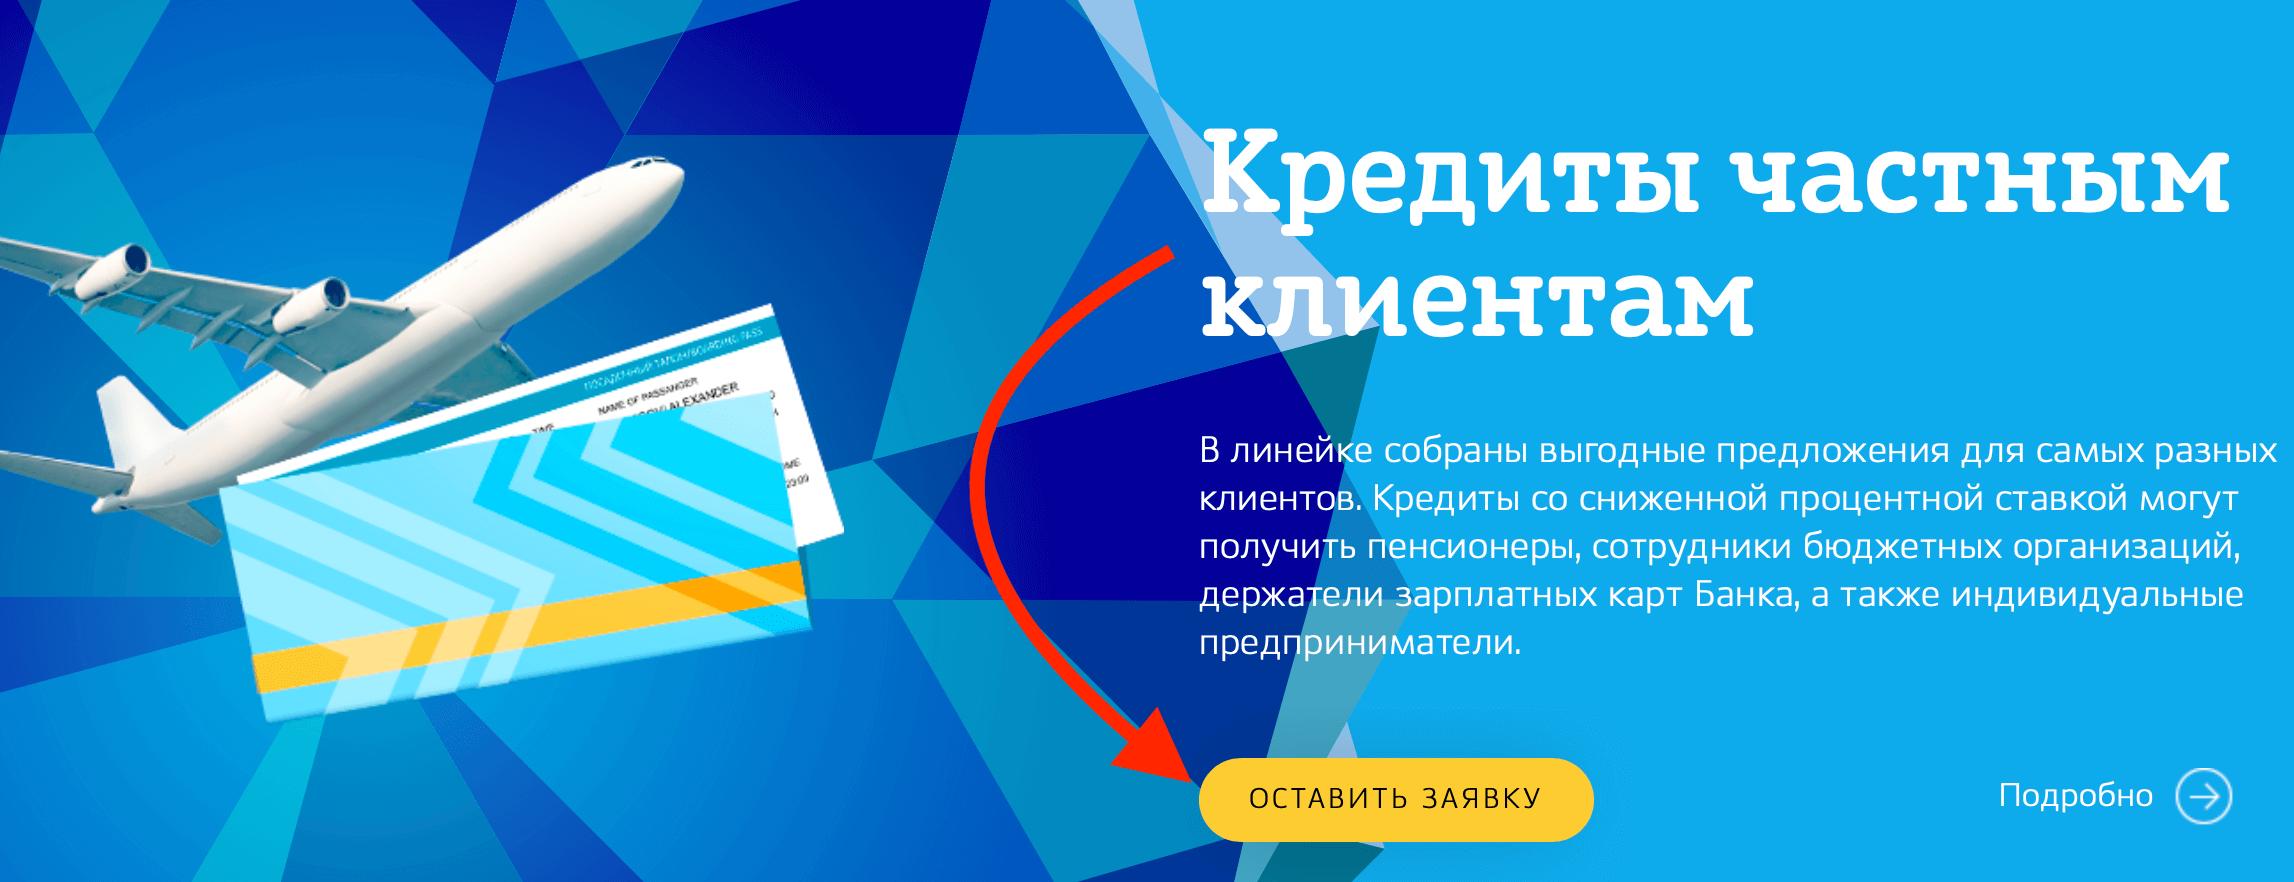 Банк кубань кредит краснодар онлайн заявка онлайн кредит где лучше взять